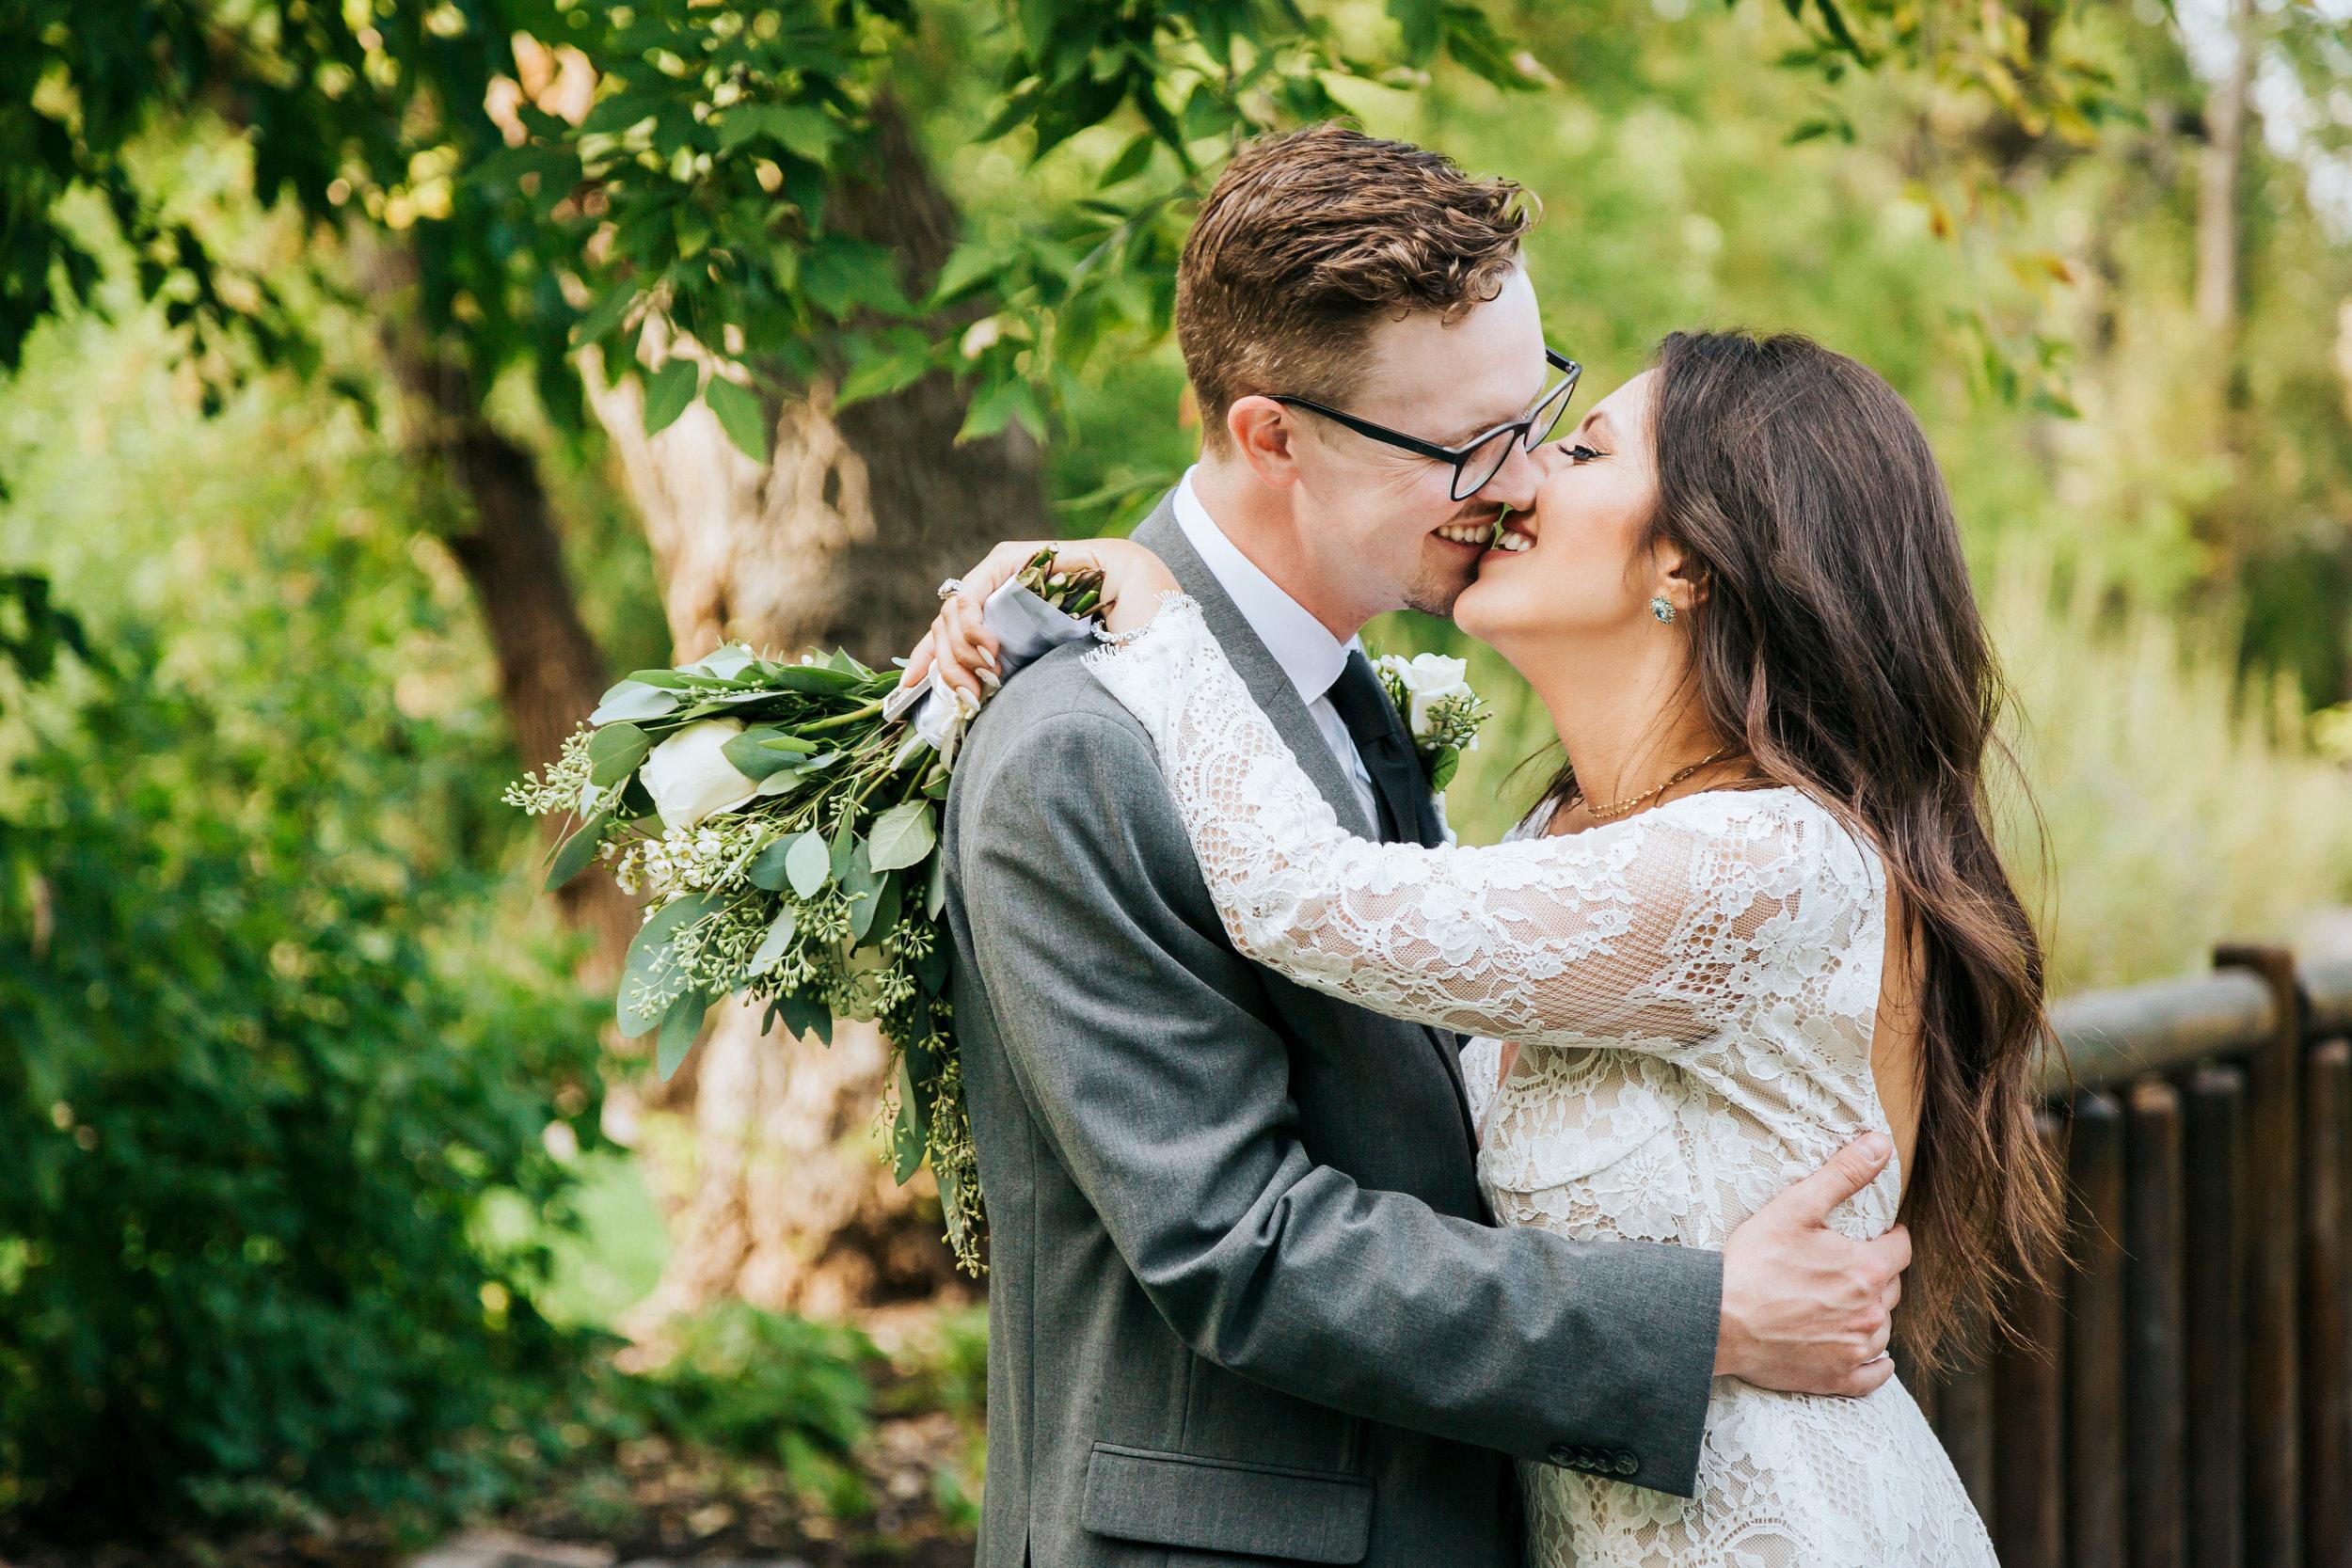 Chase-Annalise-Bontanic Gardens-Chatfield-Denver-Wedding-221.JPG